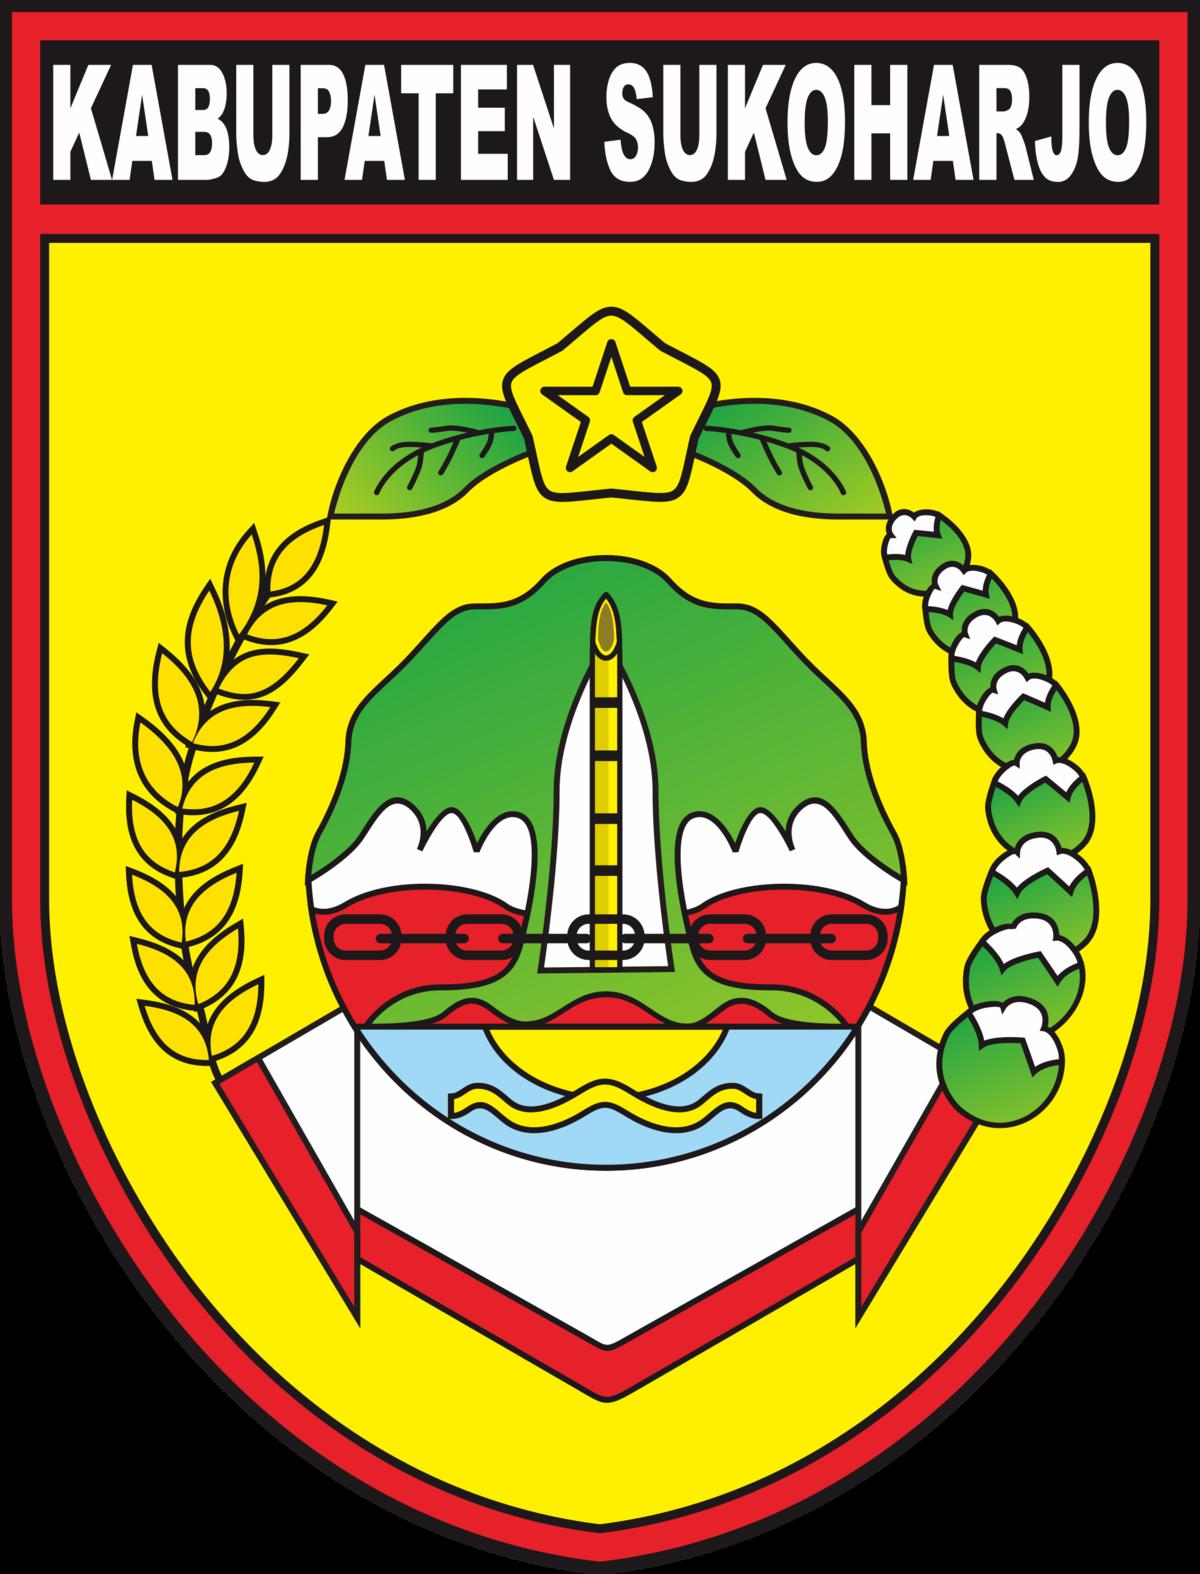 Kabupaten Sukoharjo Wikipedia Bahasa Indonesia Ensiklopedia Bebas Sendang Pinilih Kab